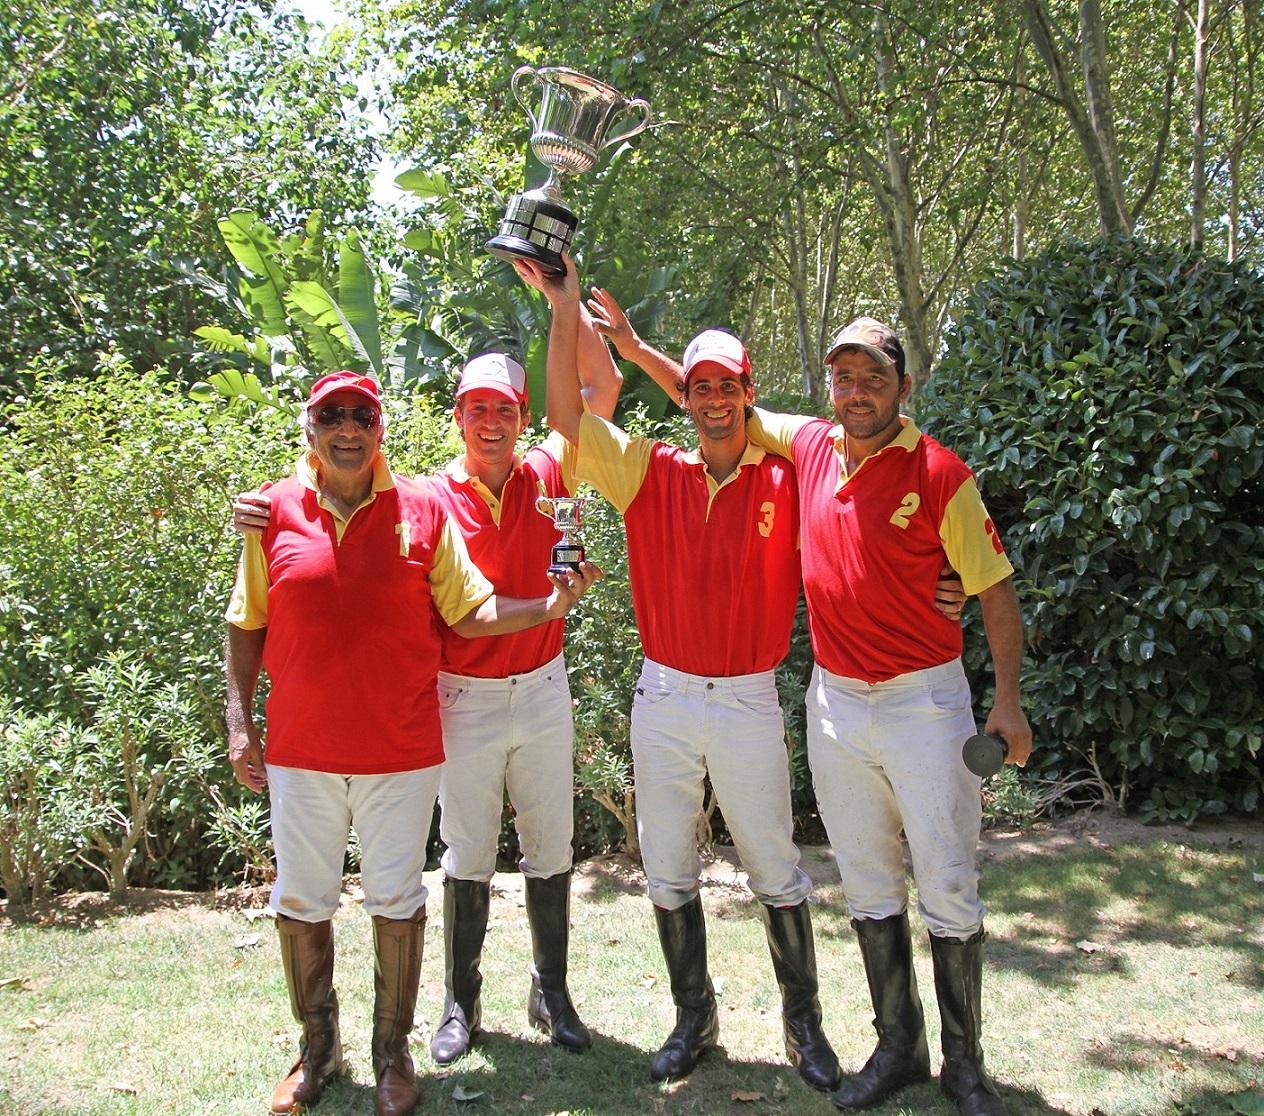 2017-07-09 Santa Maria Polo Club (Dr A campeón del Memorial Zobel) (2)